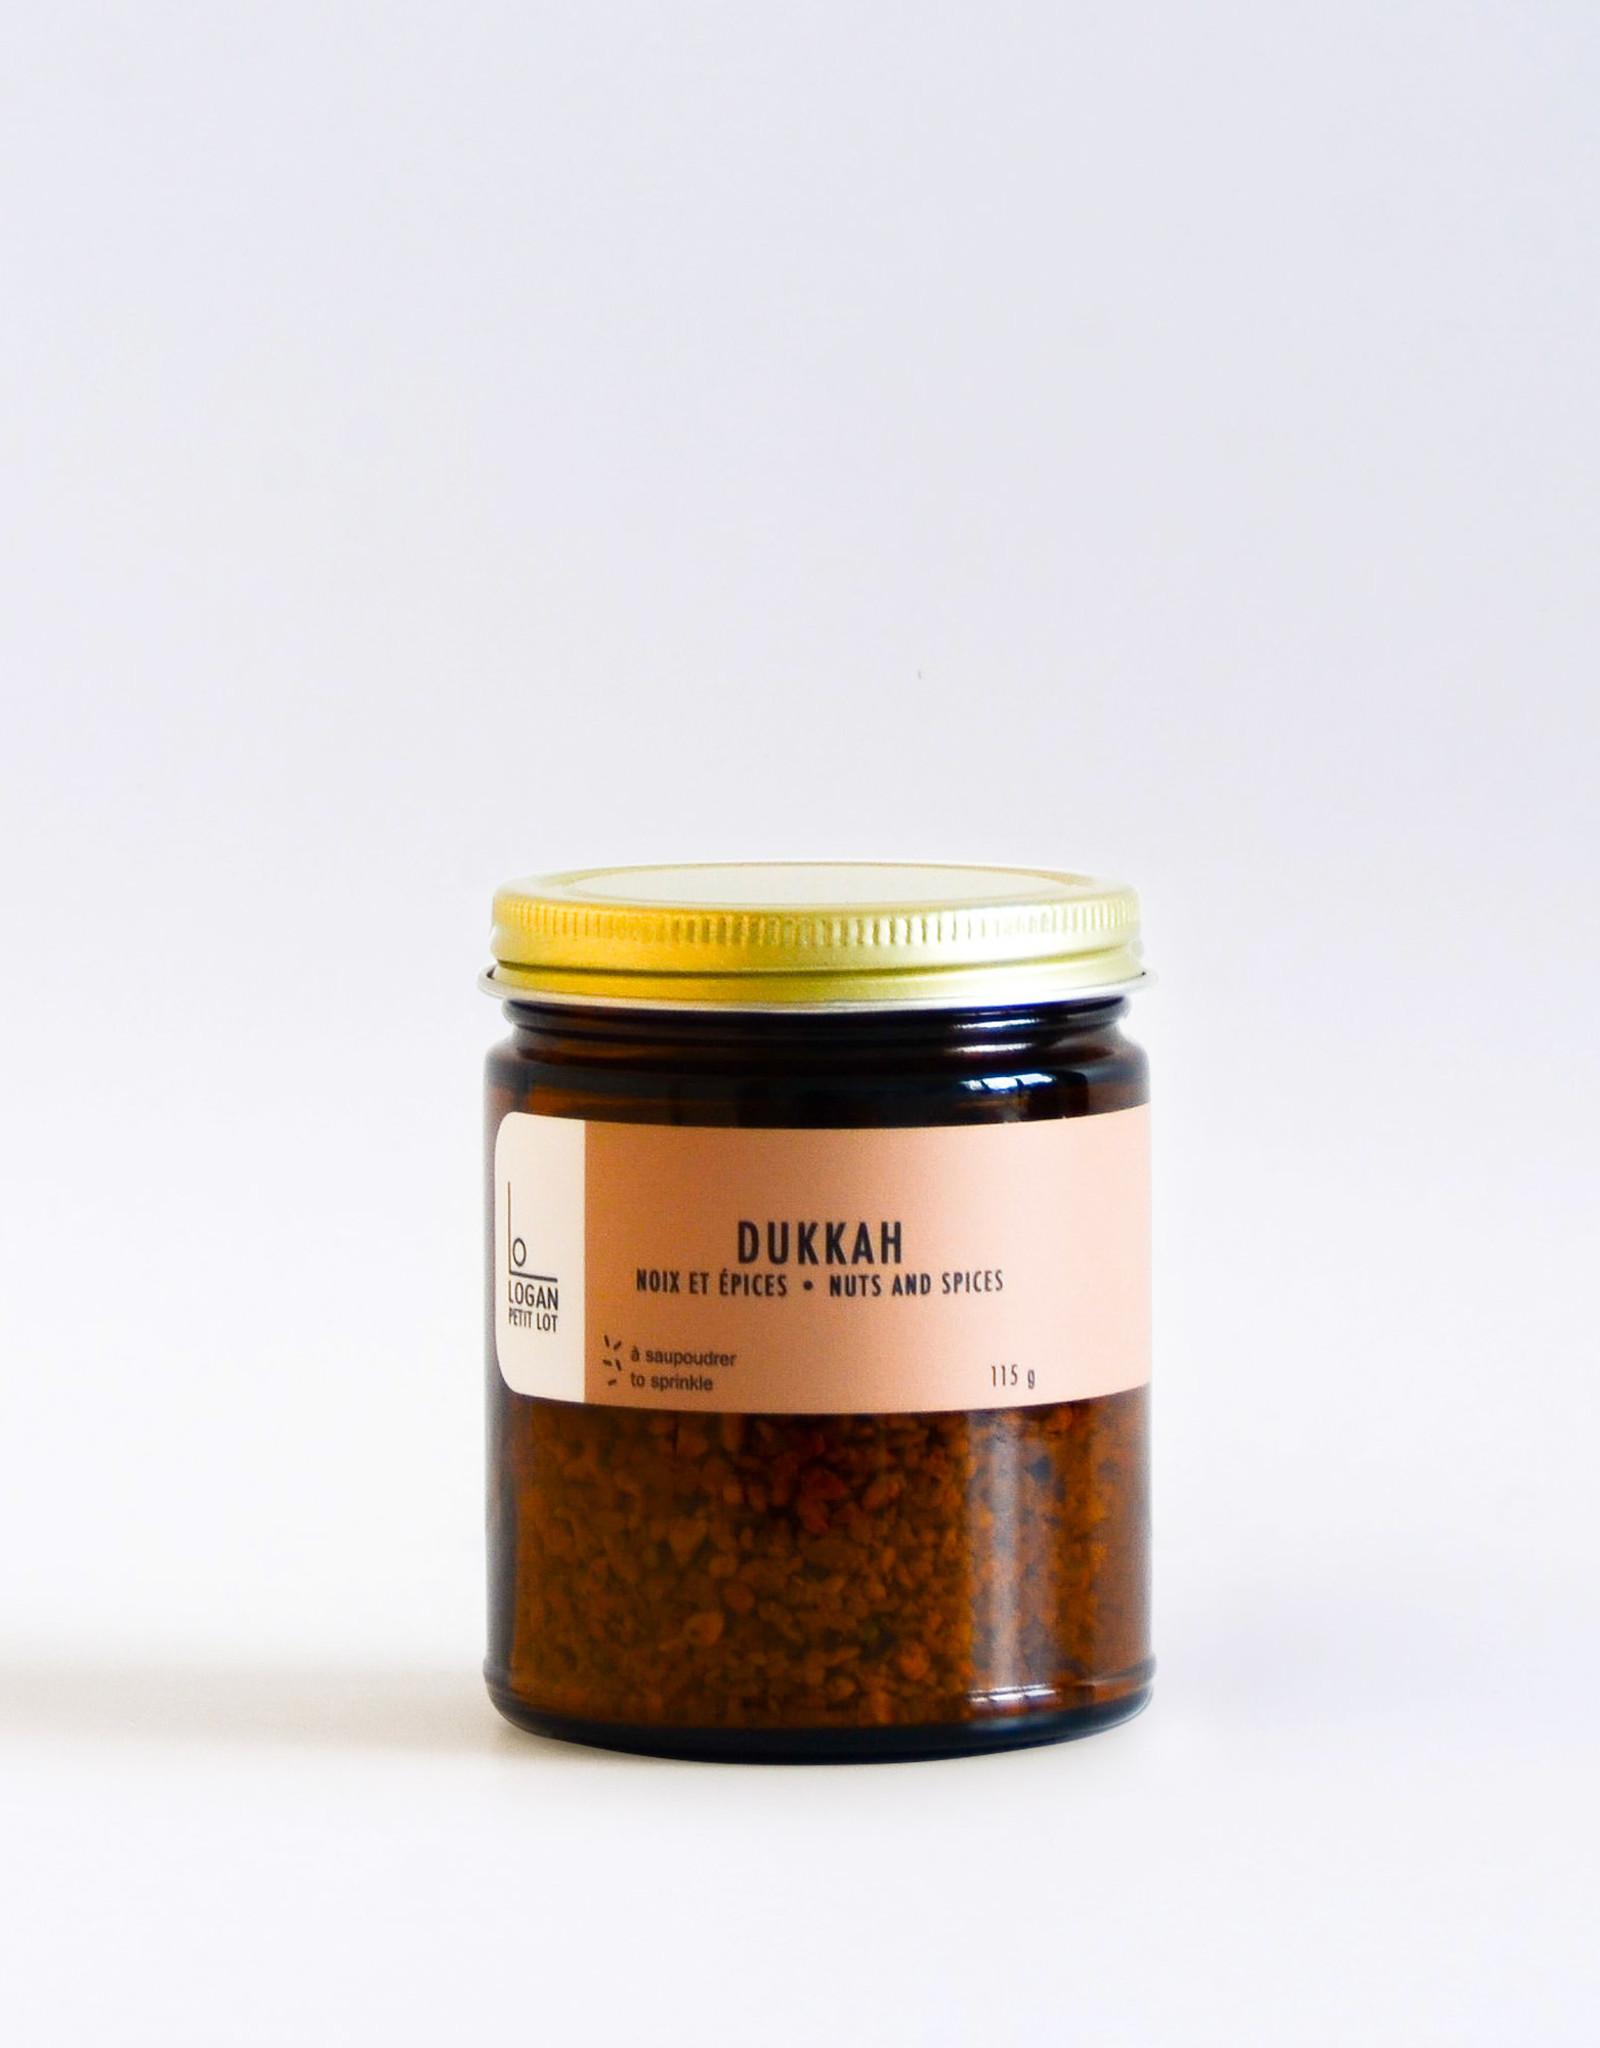 Logan Petit Lot Dukkah - Nuts and Spices